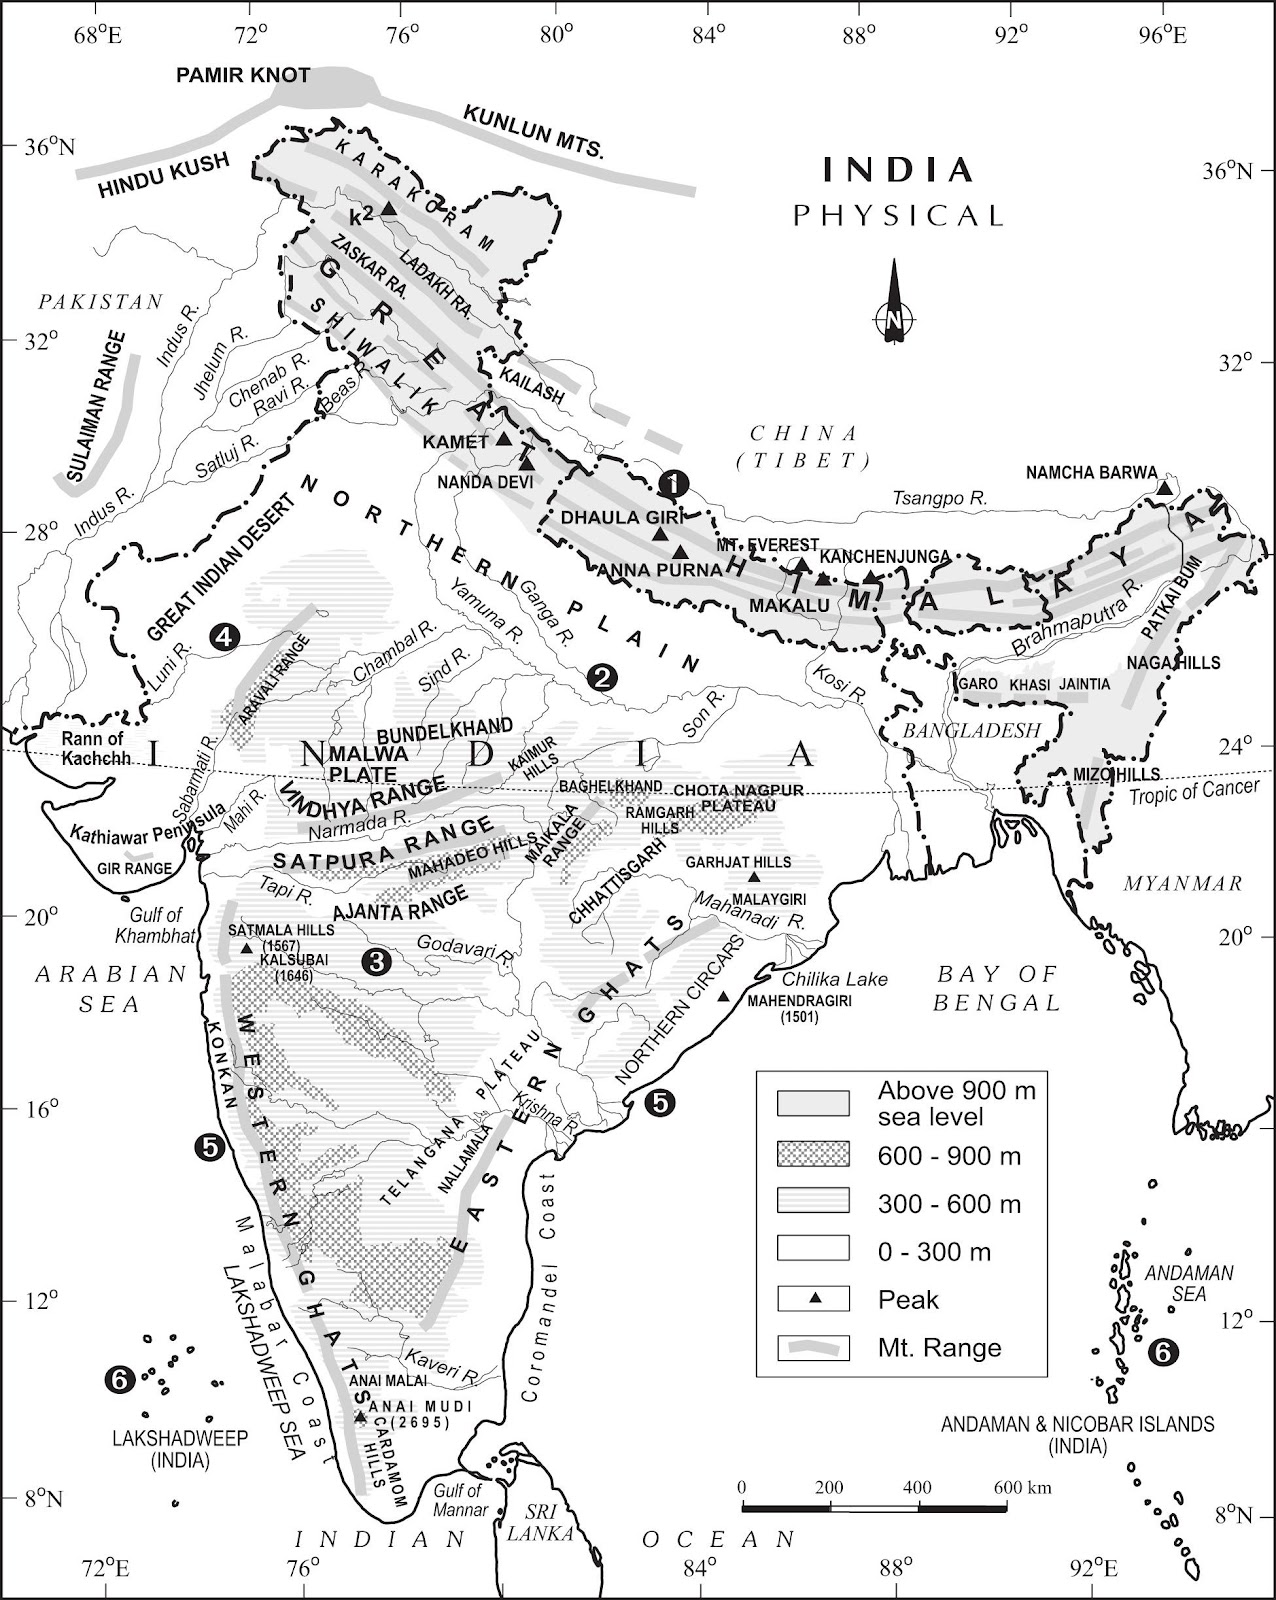 UPSC general studies and current affairs 2015: June 2012